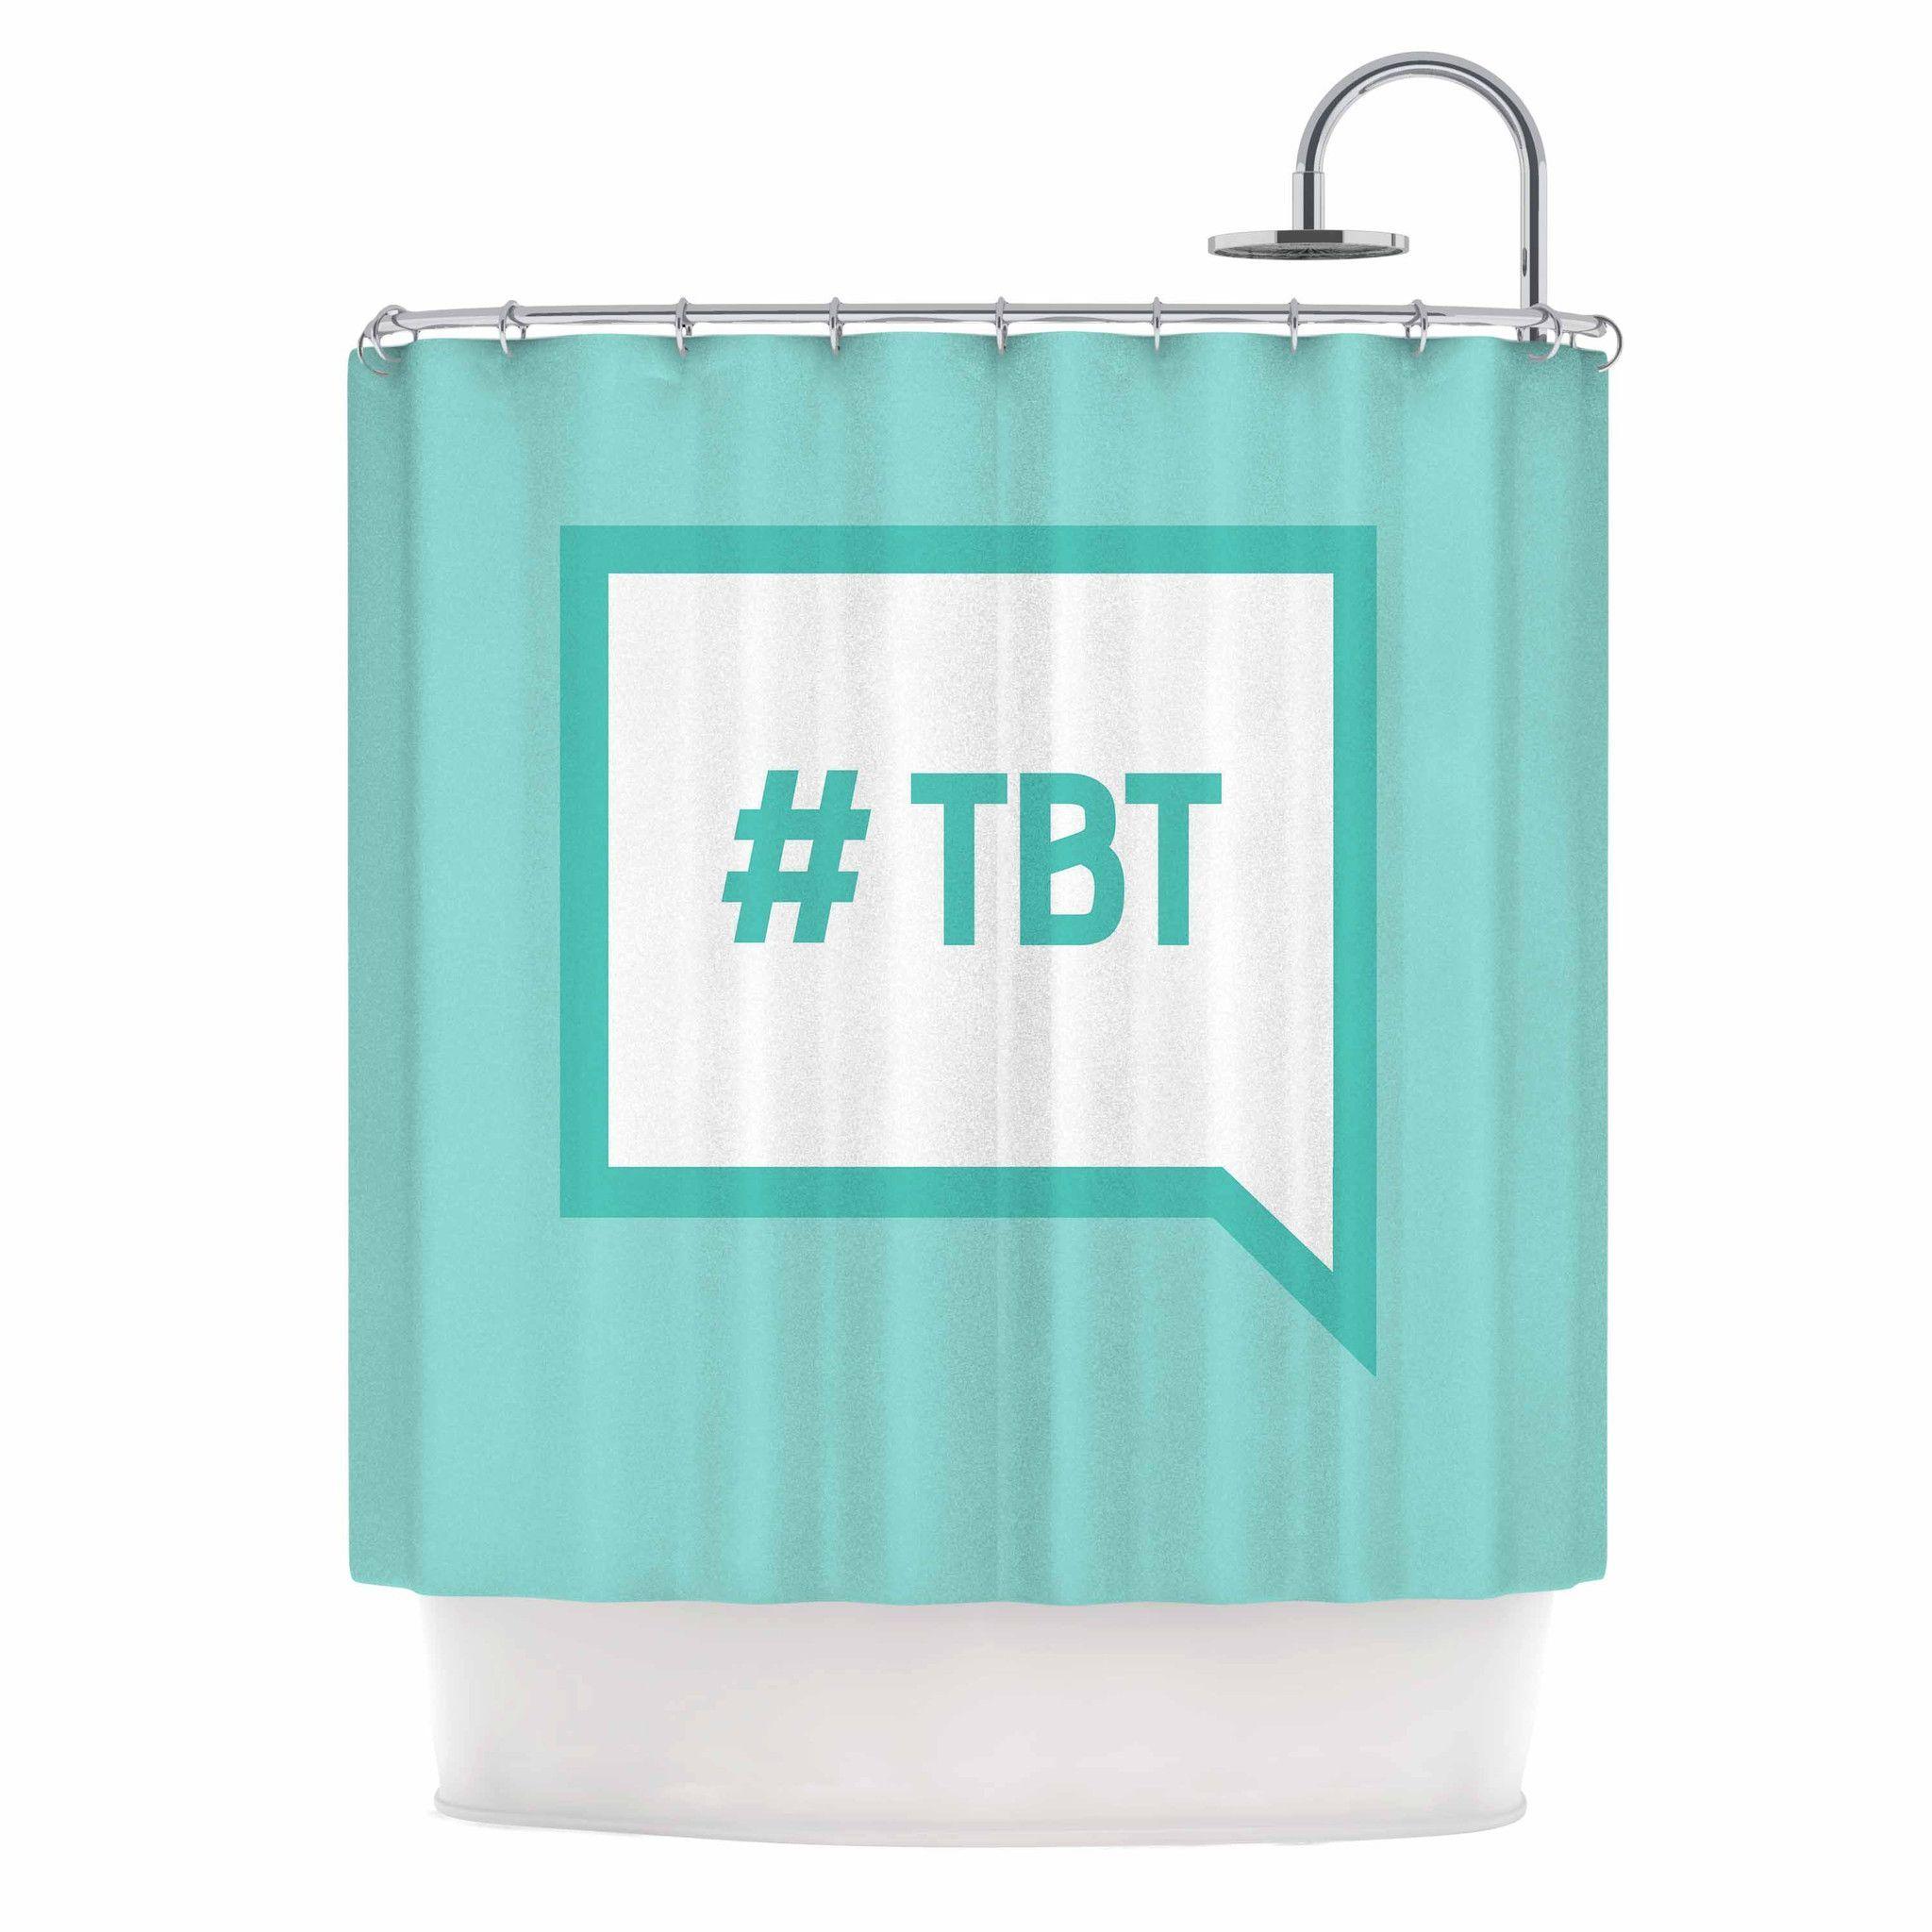 "KESS Original ""Throw Back Thursday"" Teal White Shower Curtain"